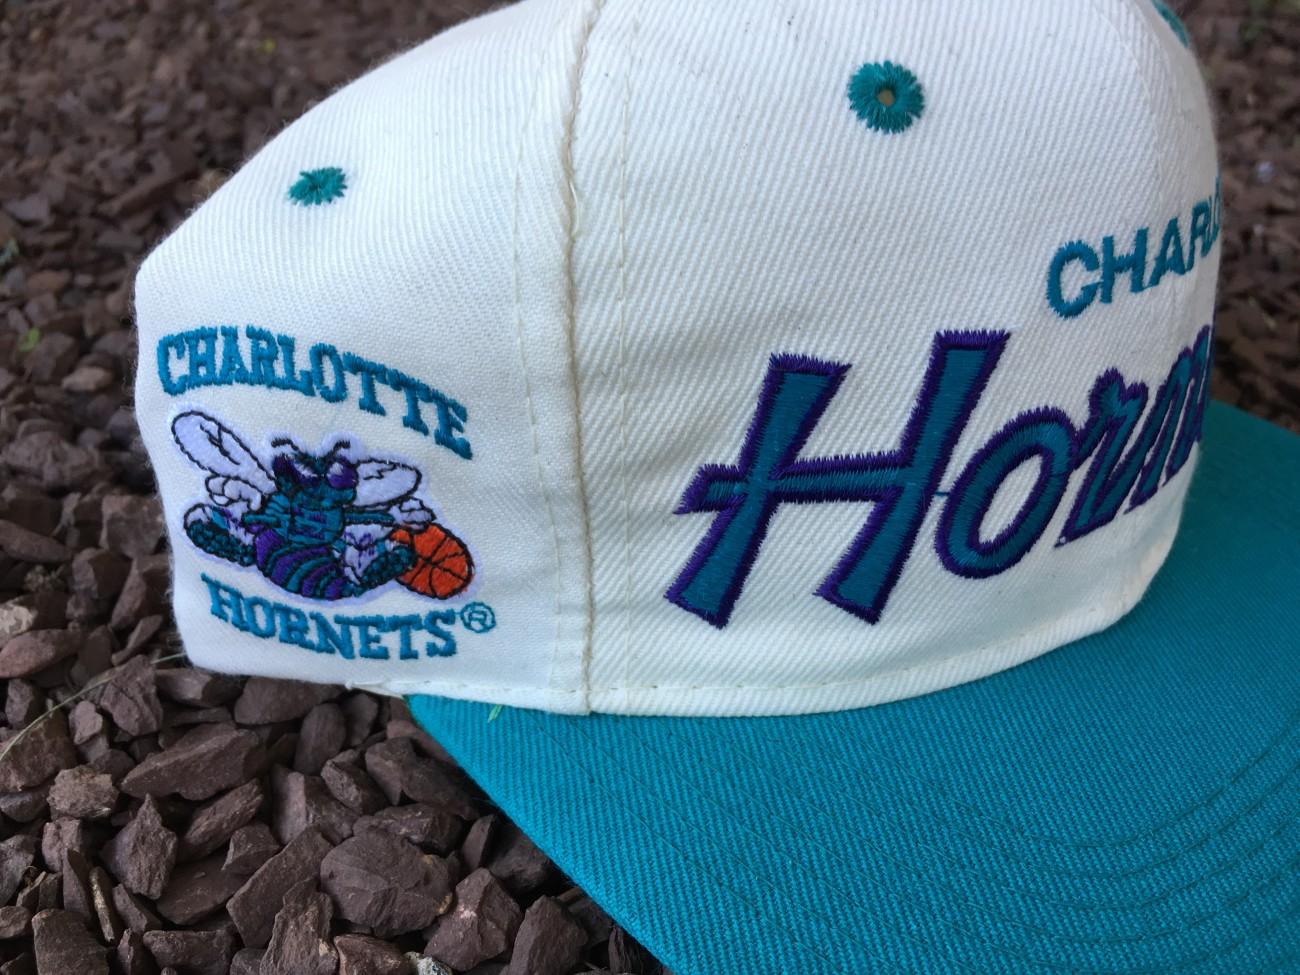 2548a8d6a74 uk vintage sports specialties script charlotte hornets snapback hat c7467  8501a